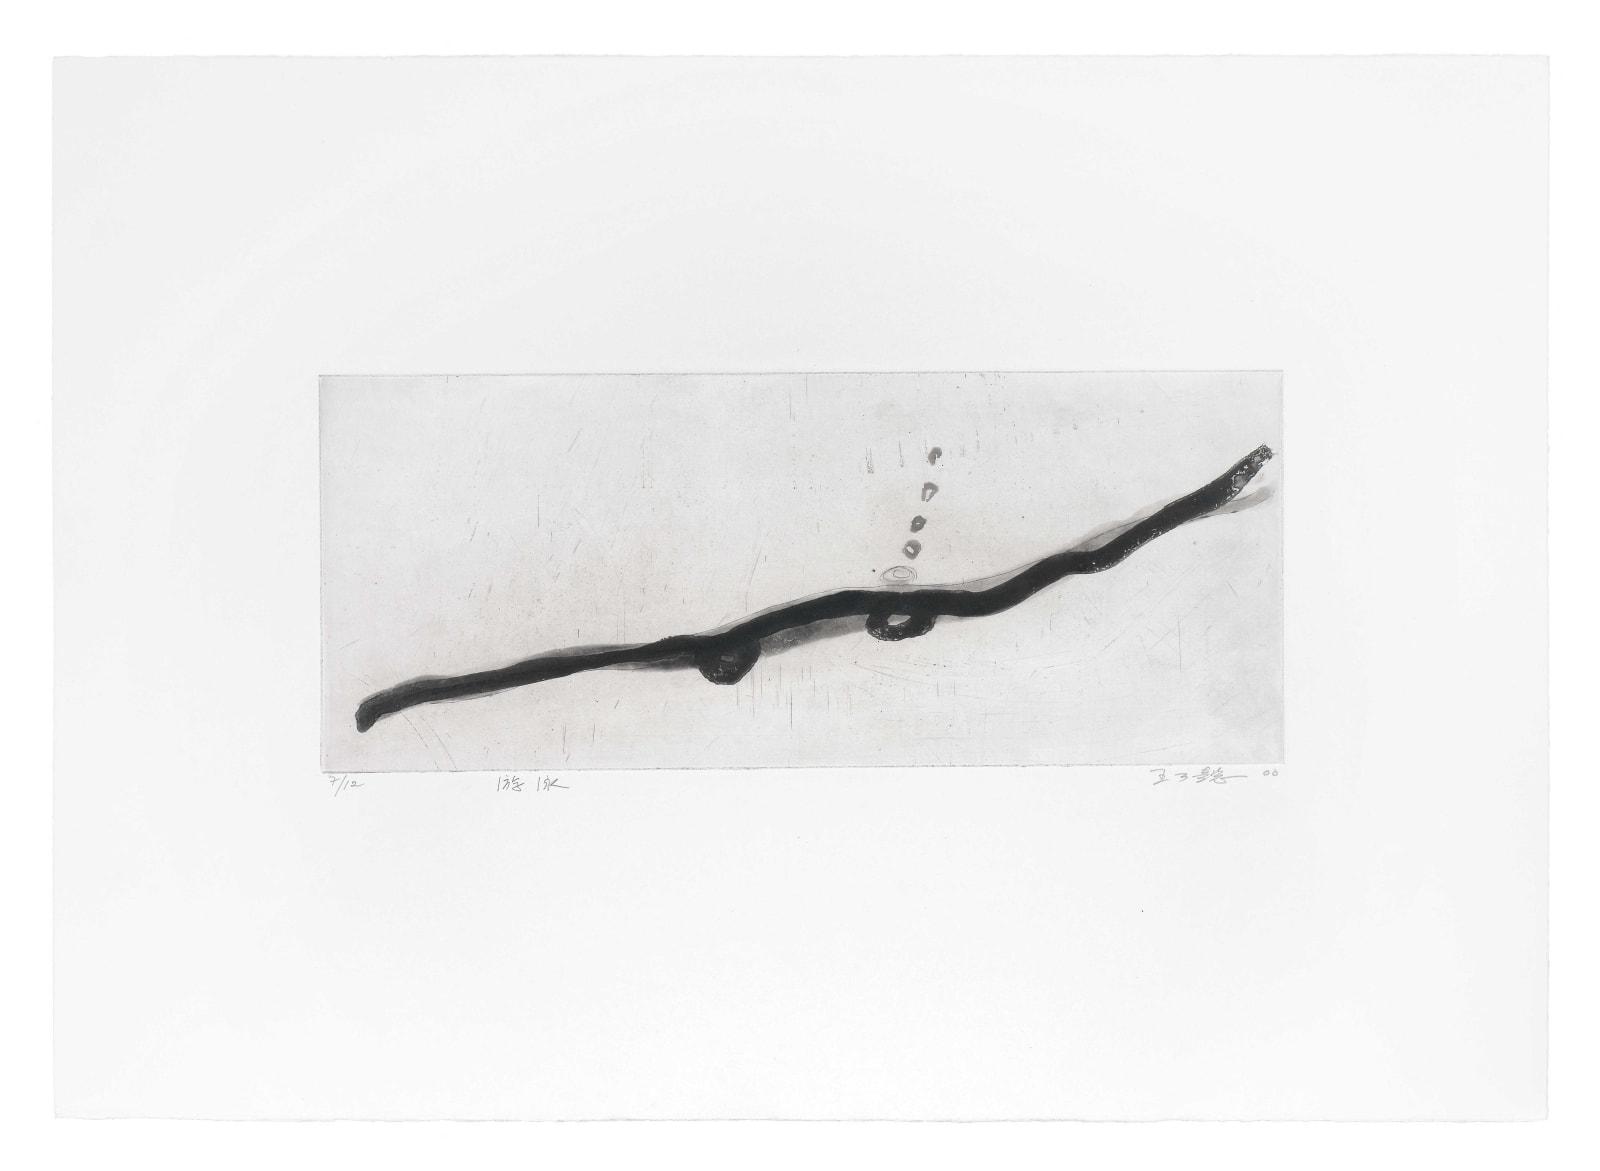 Wang Gongyi 王公懿, Swimming 游泳 (Edition 7 of 12), 2000